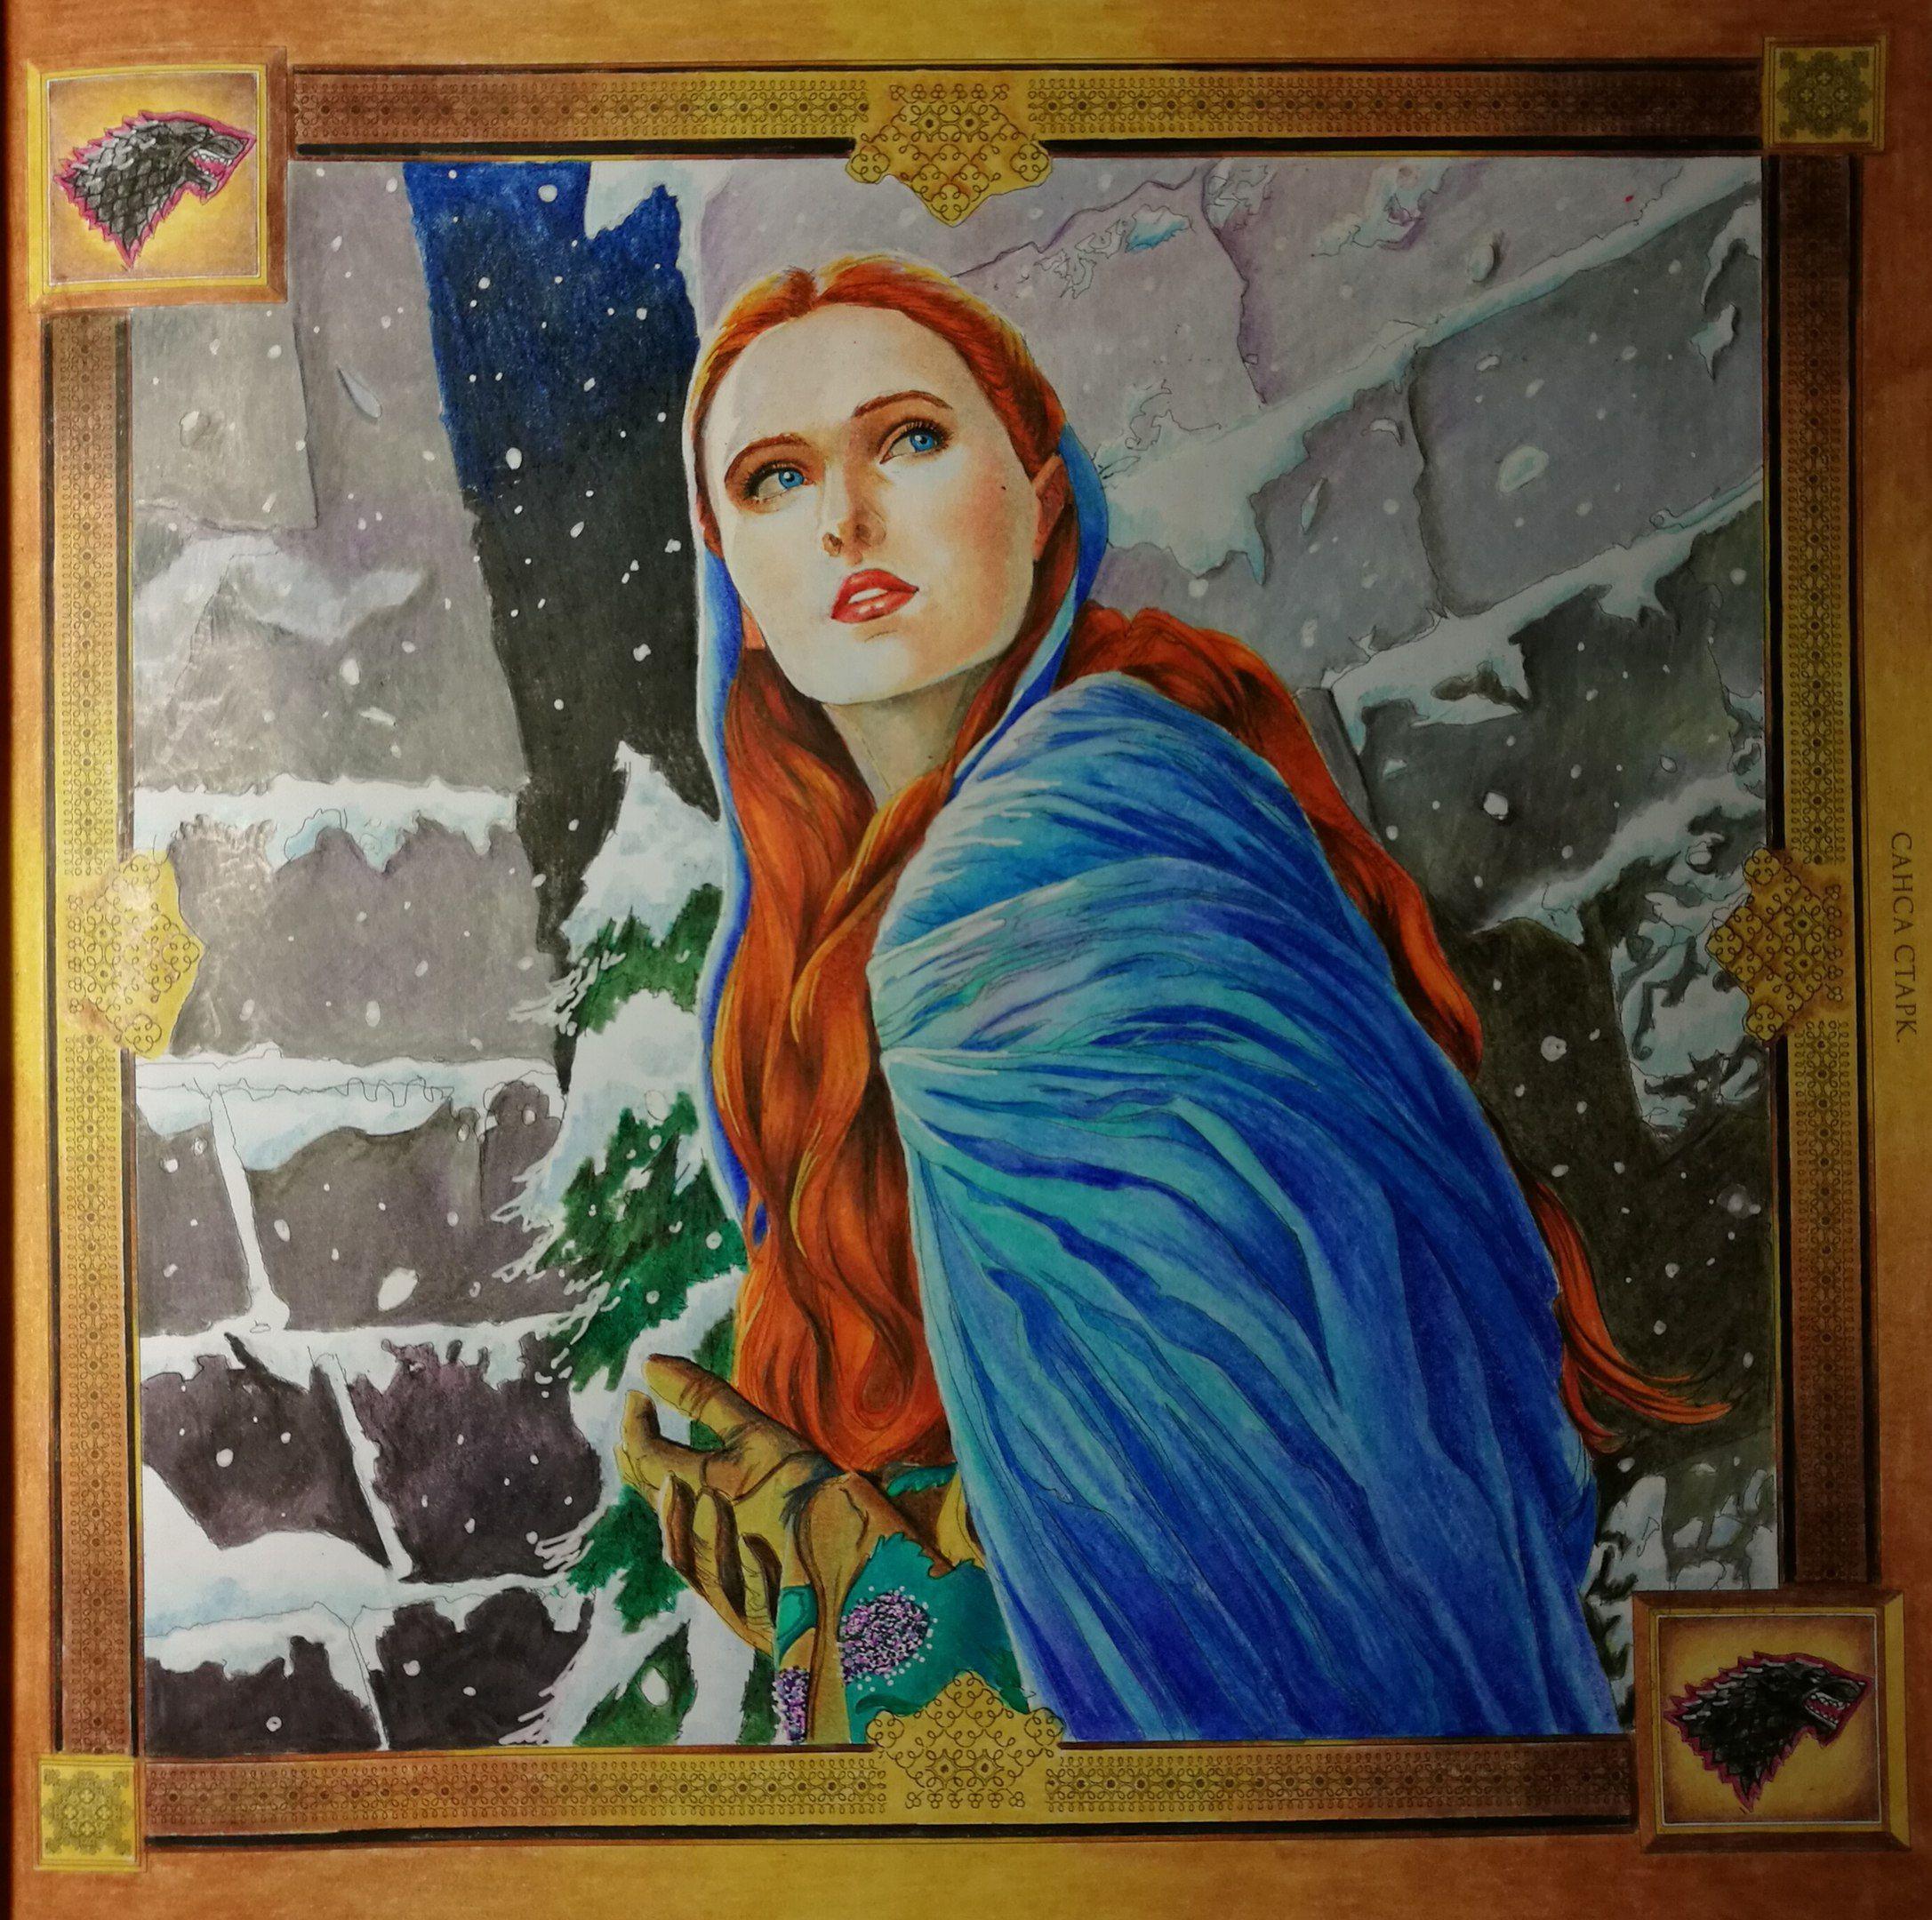 #игра престолов | Раскраски, Игры, Игра престолов